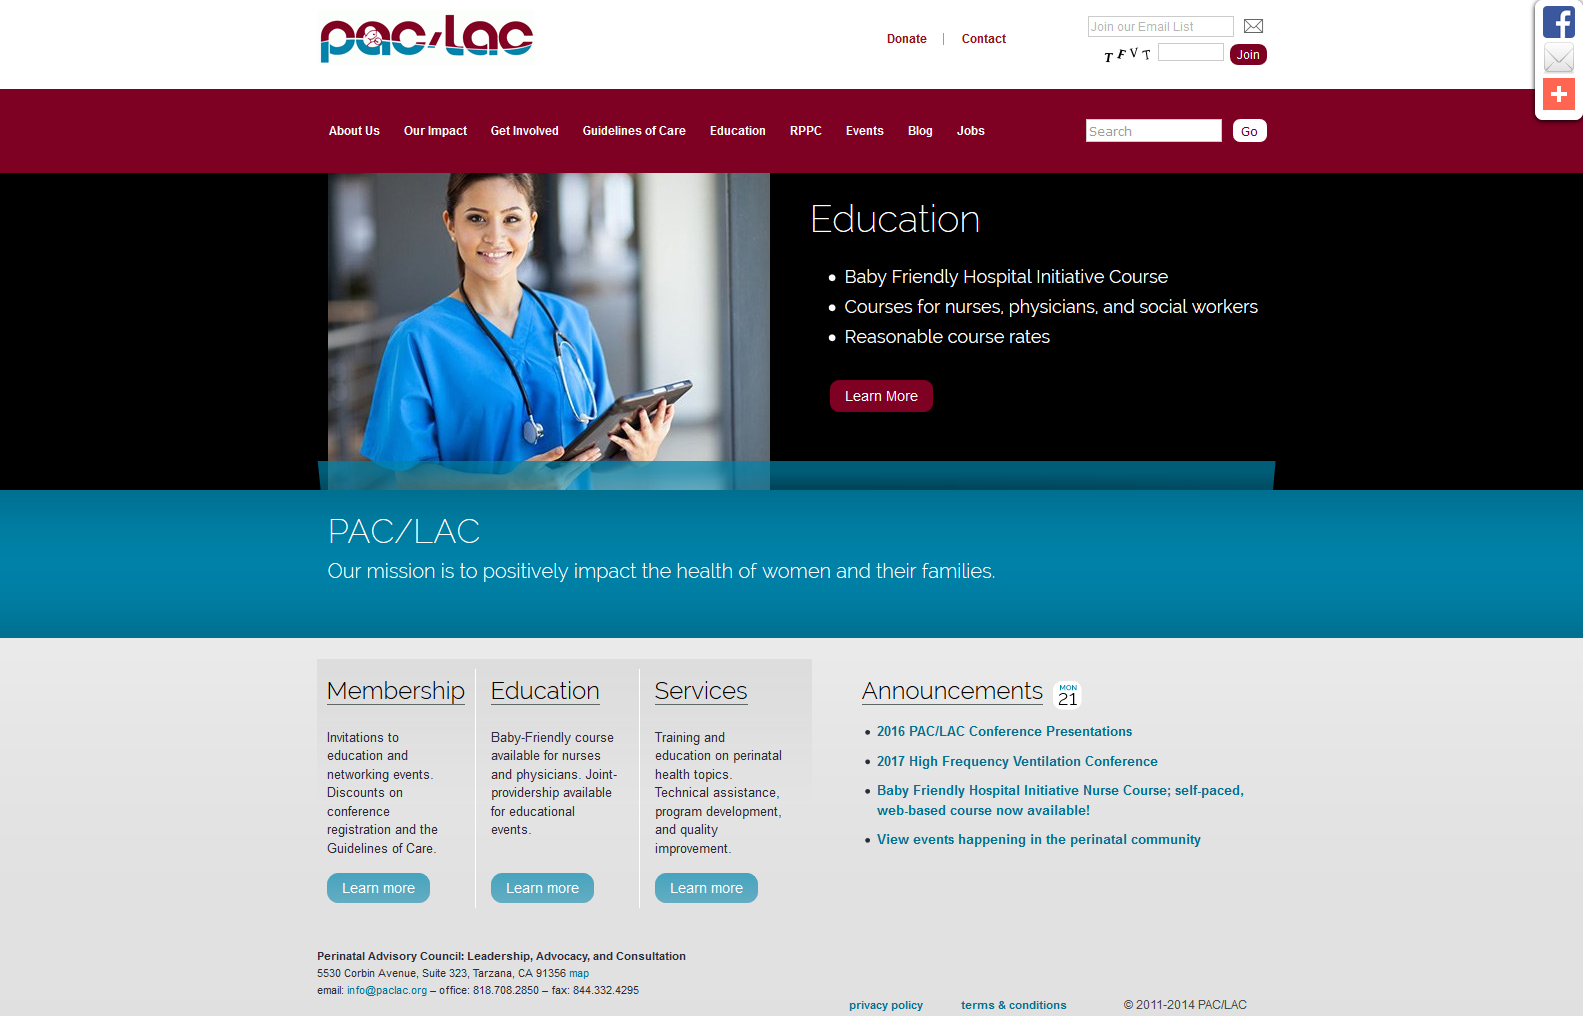 PAC/LAC